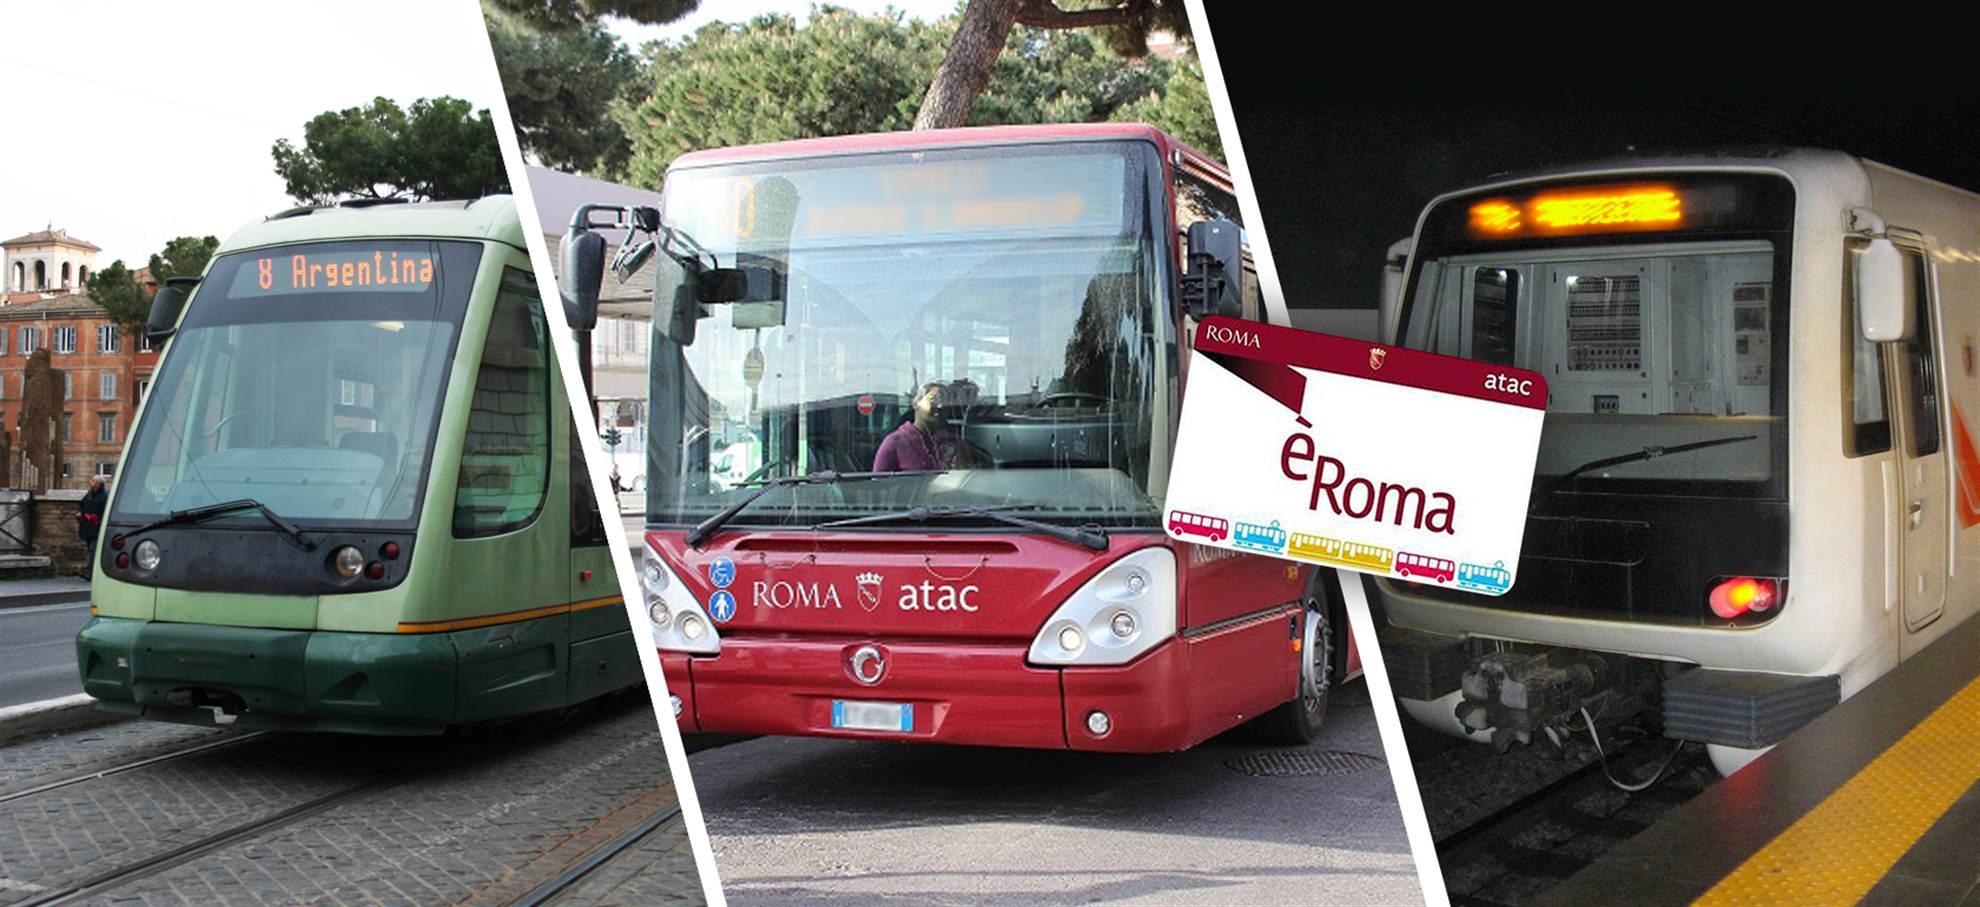 Rome Public Transport Card (Atac Metro Card)